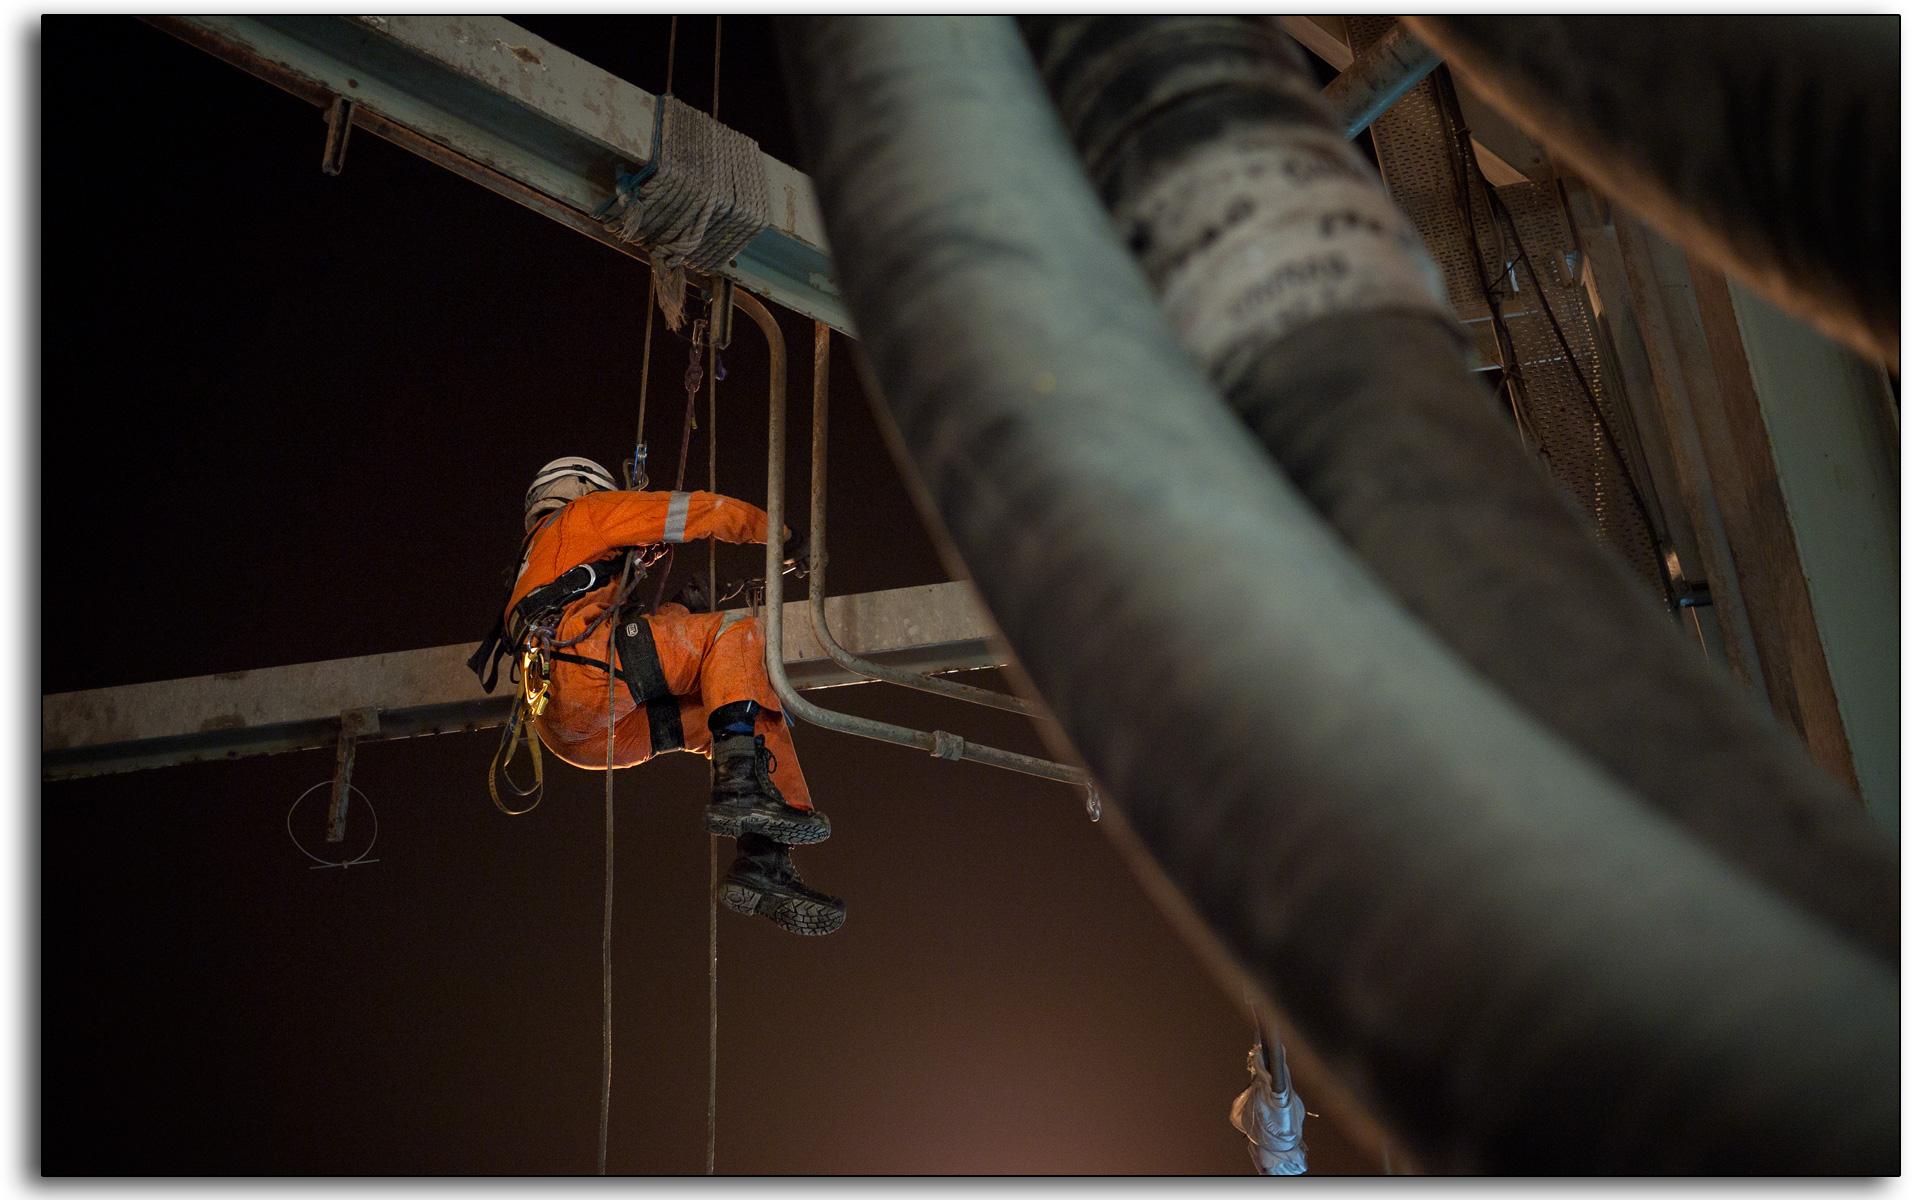 07 Robert Rab Hamilton working at height night shift Chirag BP platform Caspian sea offshore.jpg